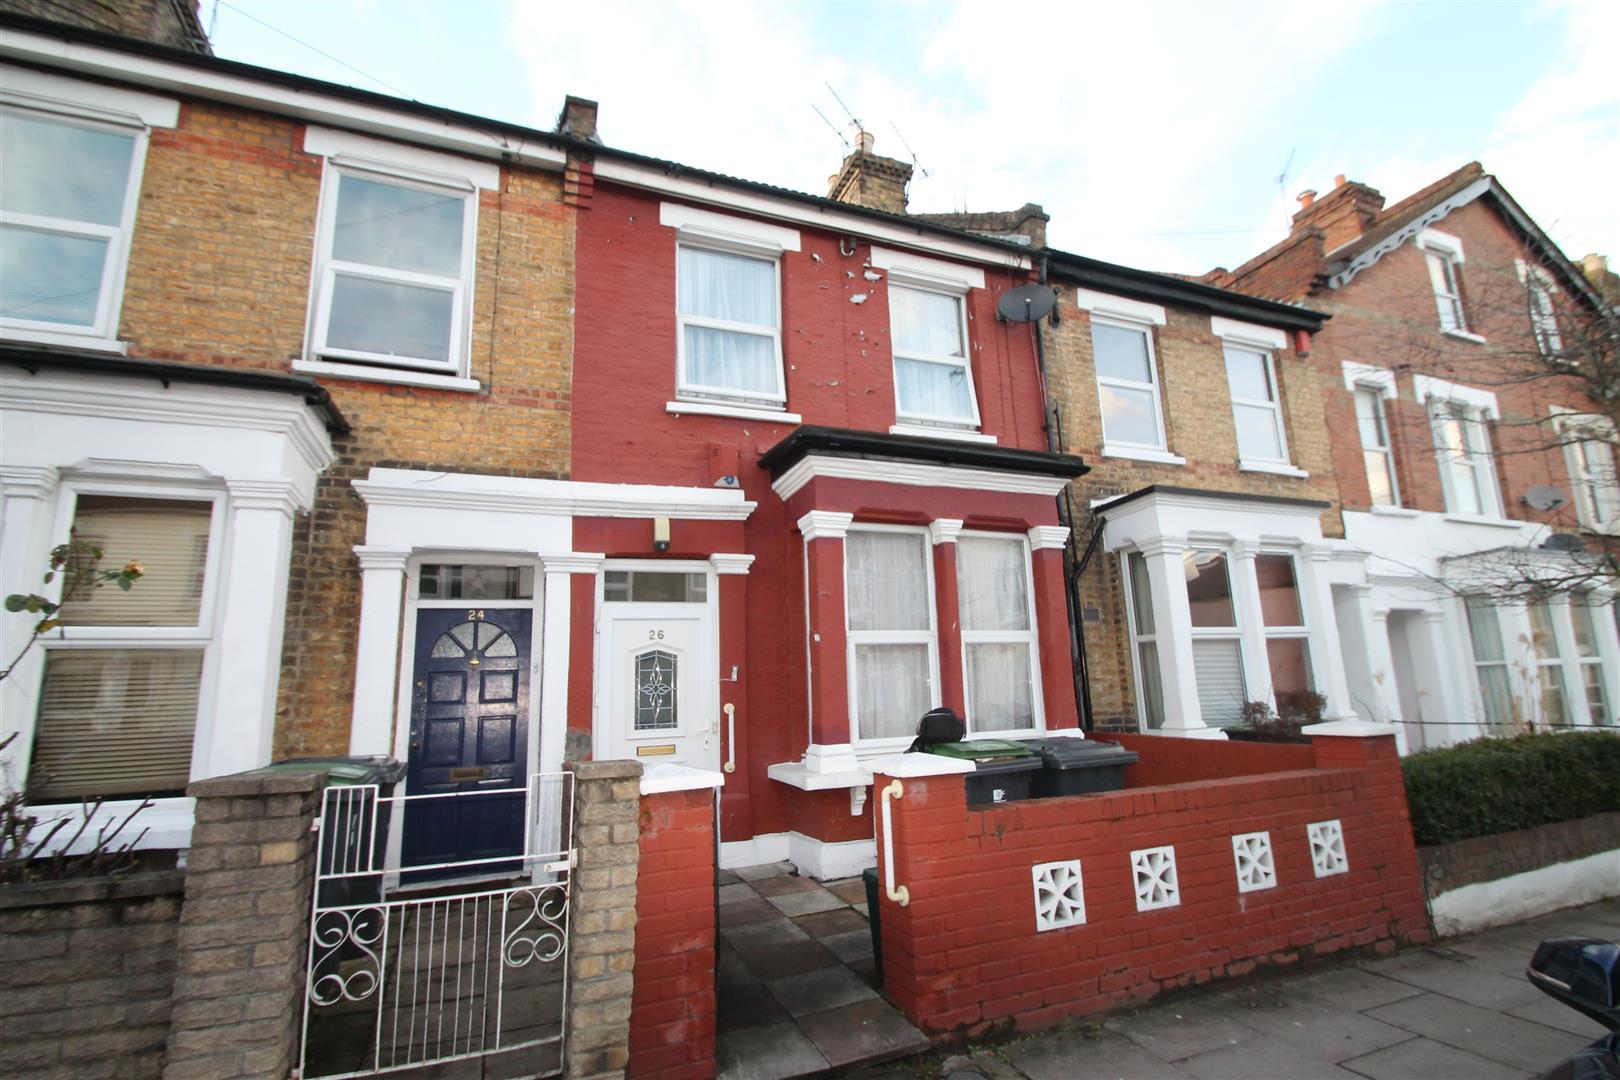 3 Bedroom House For Sale Queens Road London N11 2qu